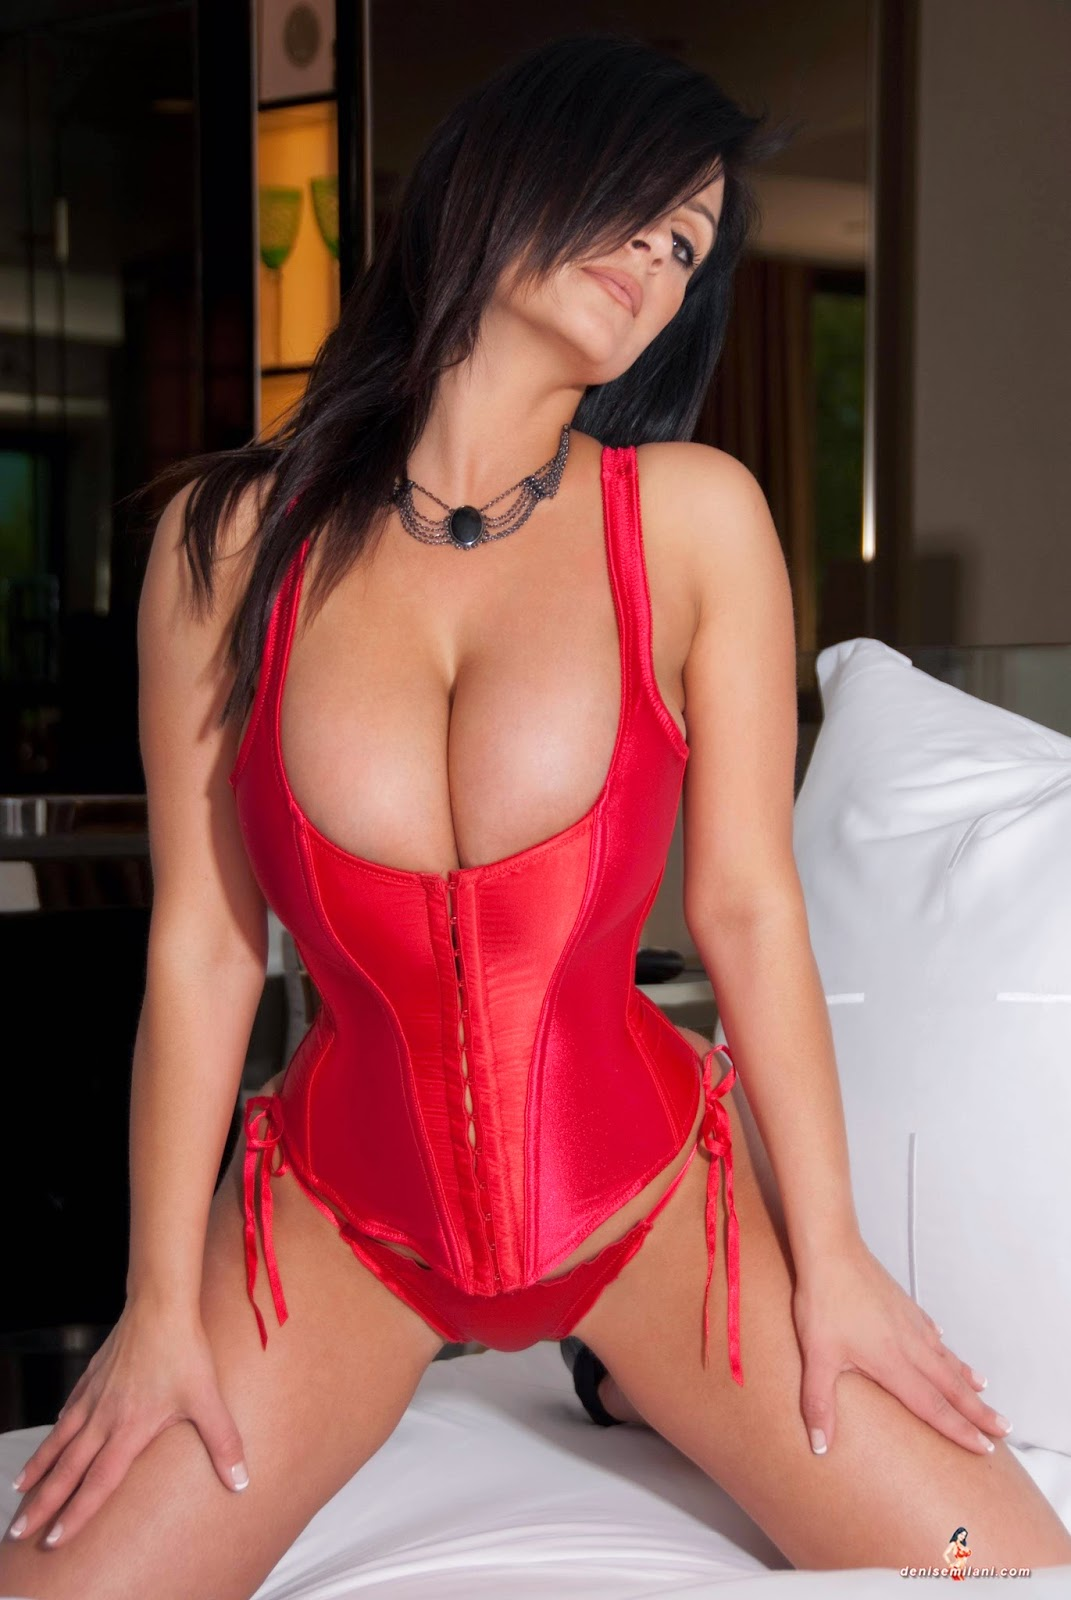 hot red corset denise milani color sexy charlotte springer set archives lingerie blue